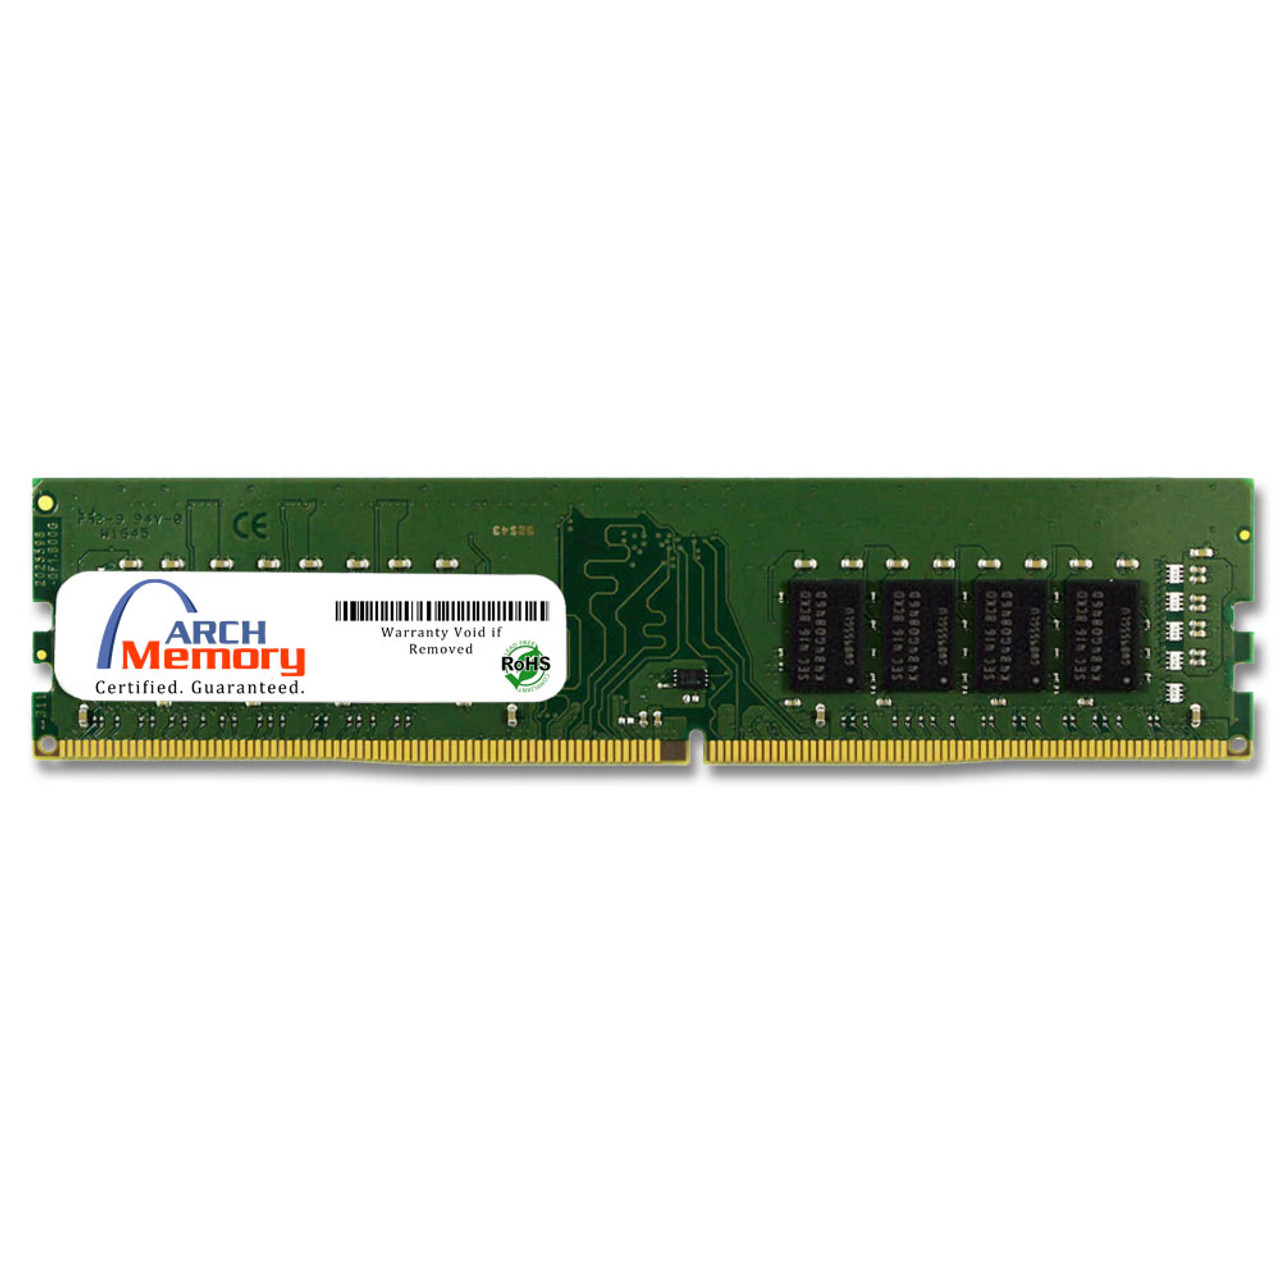 4GB DDR4-2133 PC4-17000 288-Pin Non-ECC Unbuffered RAM